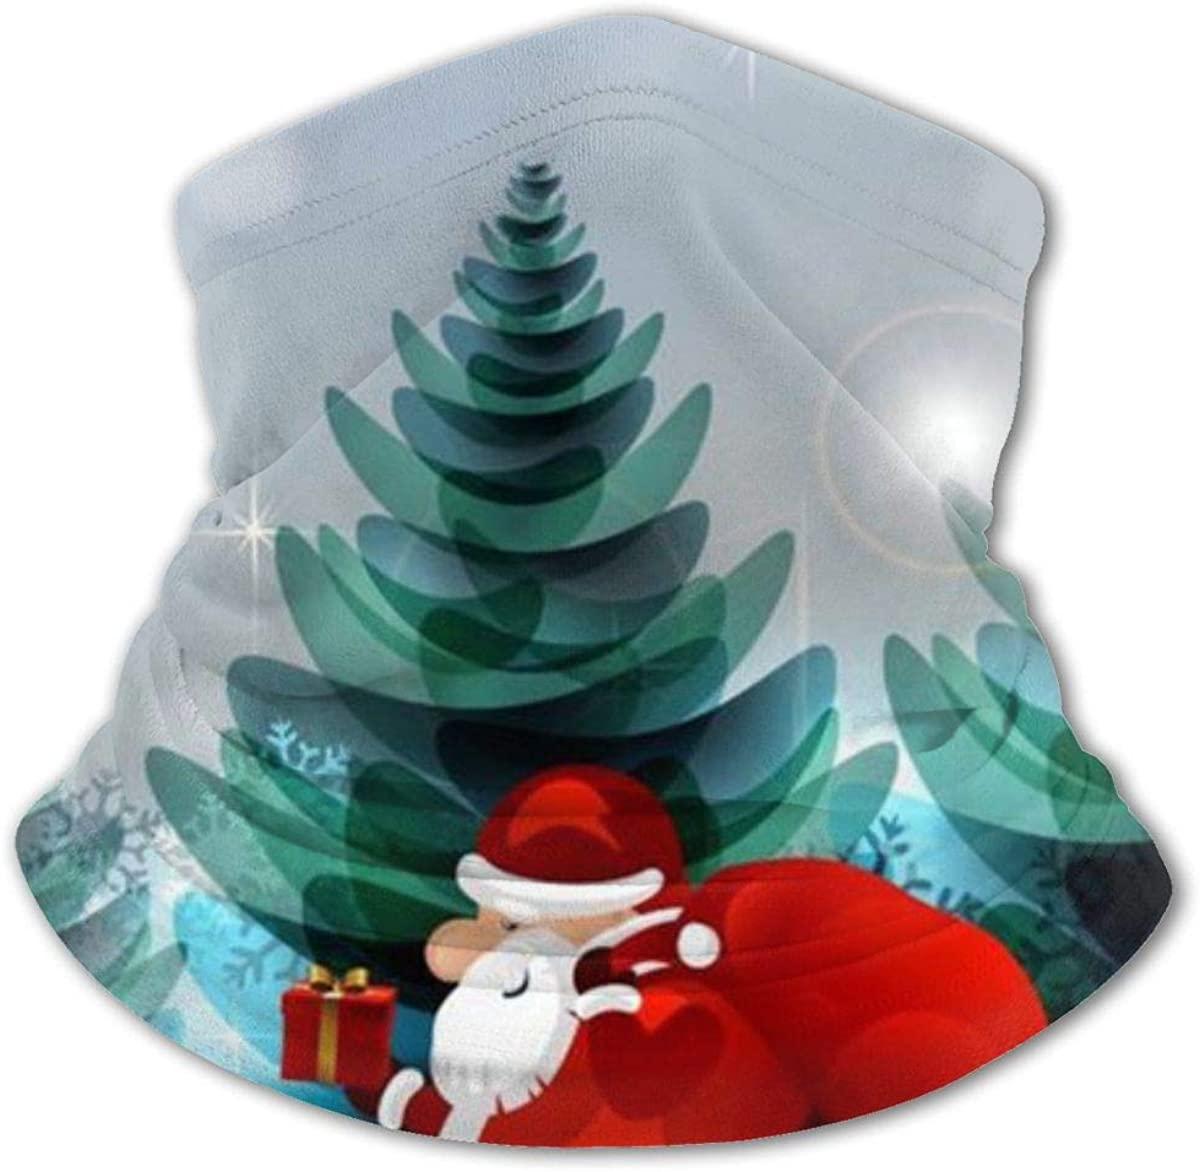 Happy Santa Headwear For Girls And Boys, Head Wrap, Neck Gaiter, Headband, Tenn Fishing Mask, Magic Scarf, Tube Mask, Face Bandana Mask For Camping Running Cycling